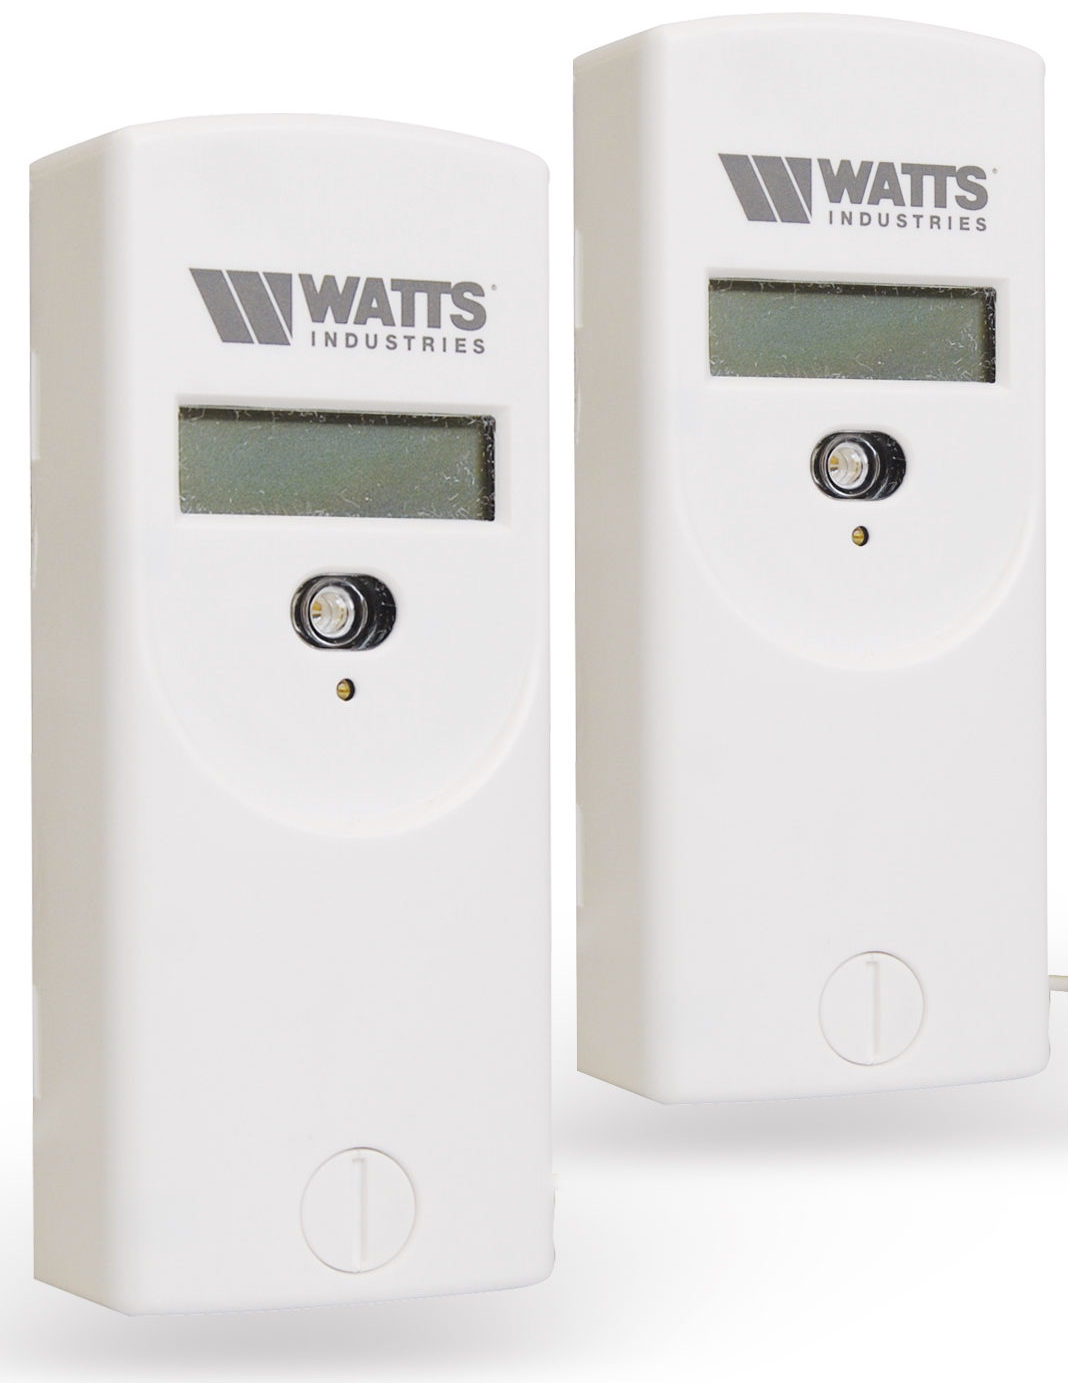 serie 556 Watts Industries